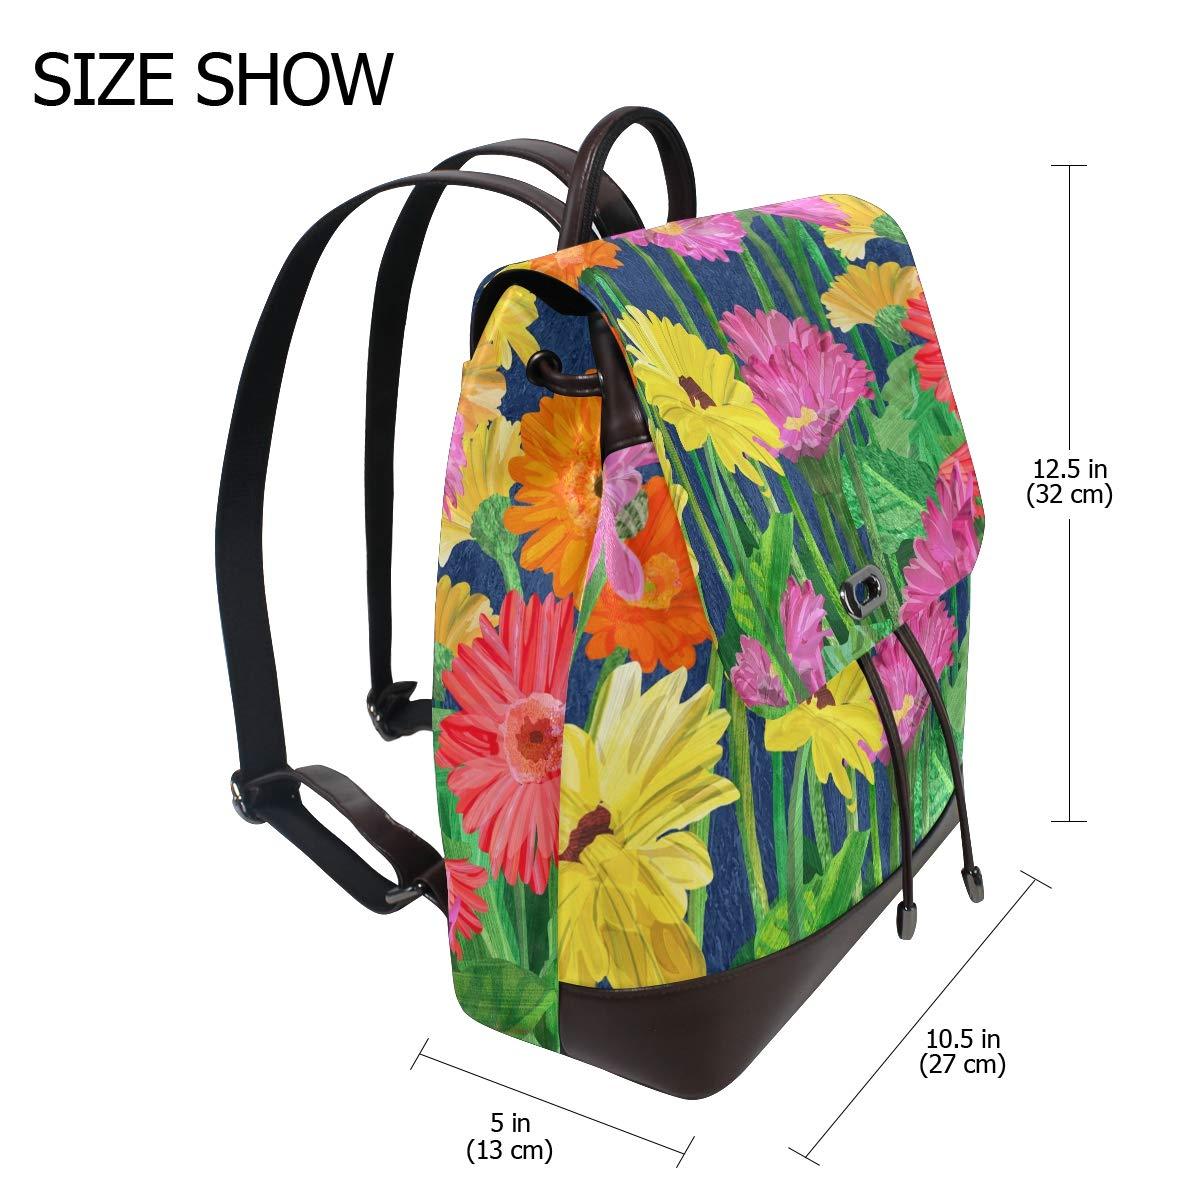 KEAKIA Women PU Leather Gerber Daisy Backpack Purse Travel School Shoulder Bag Casual Daypack